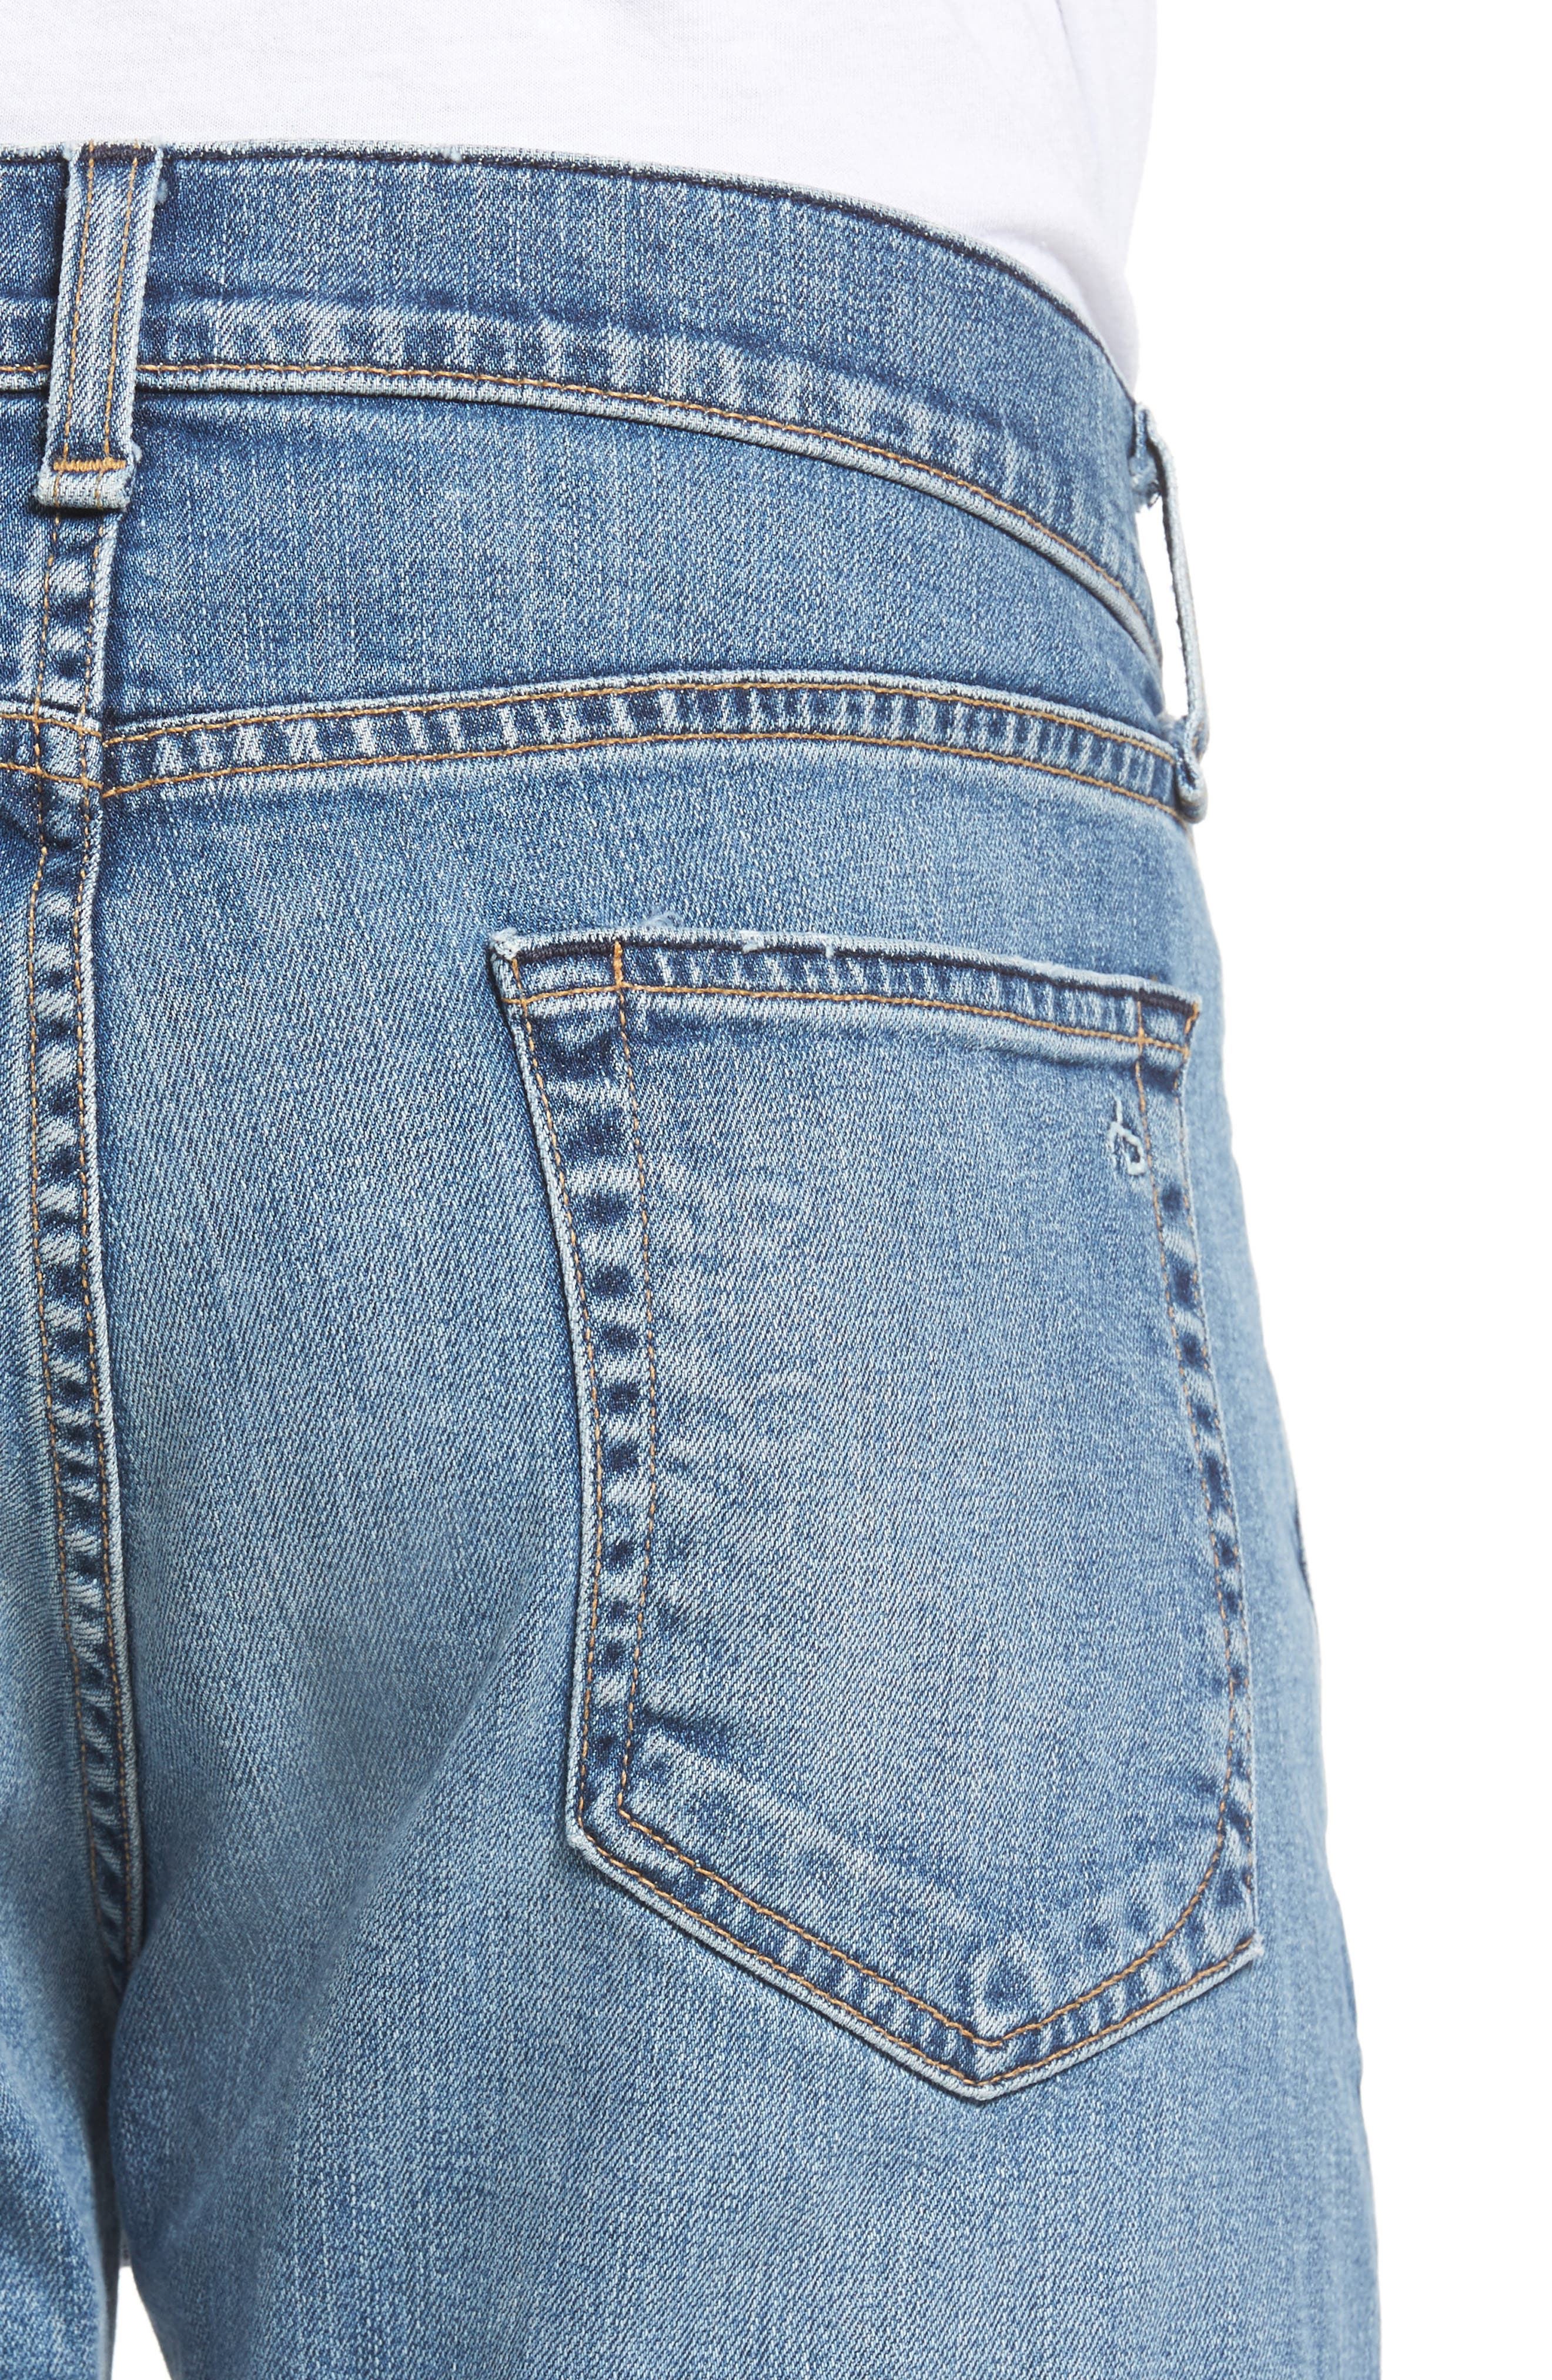 Fit 2 Slim Fit Jeans,                             Alternate thumbnail 4, color,                             DARK KINGSTON